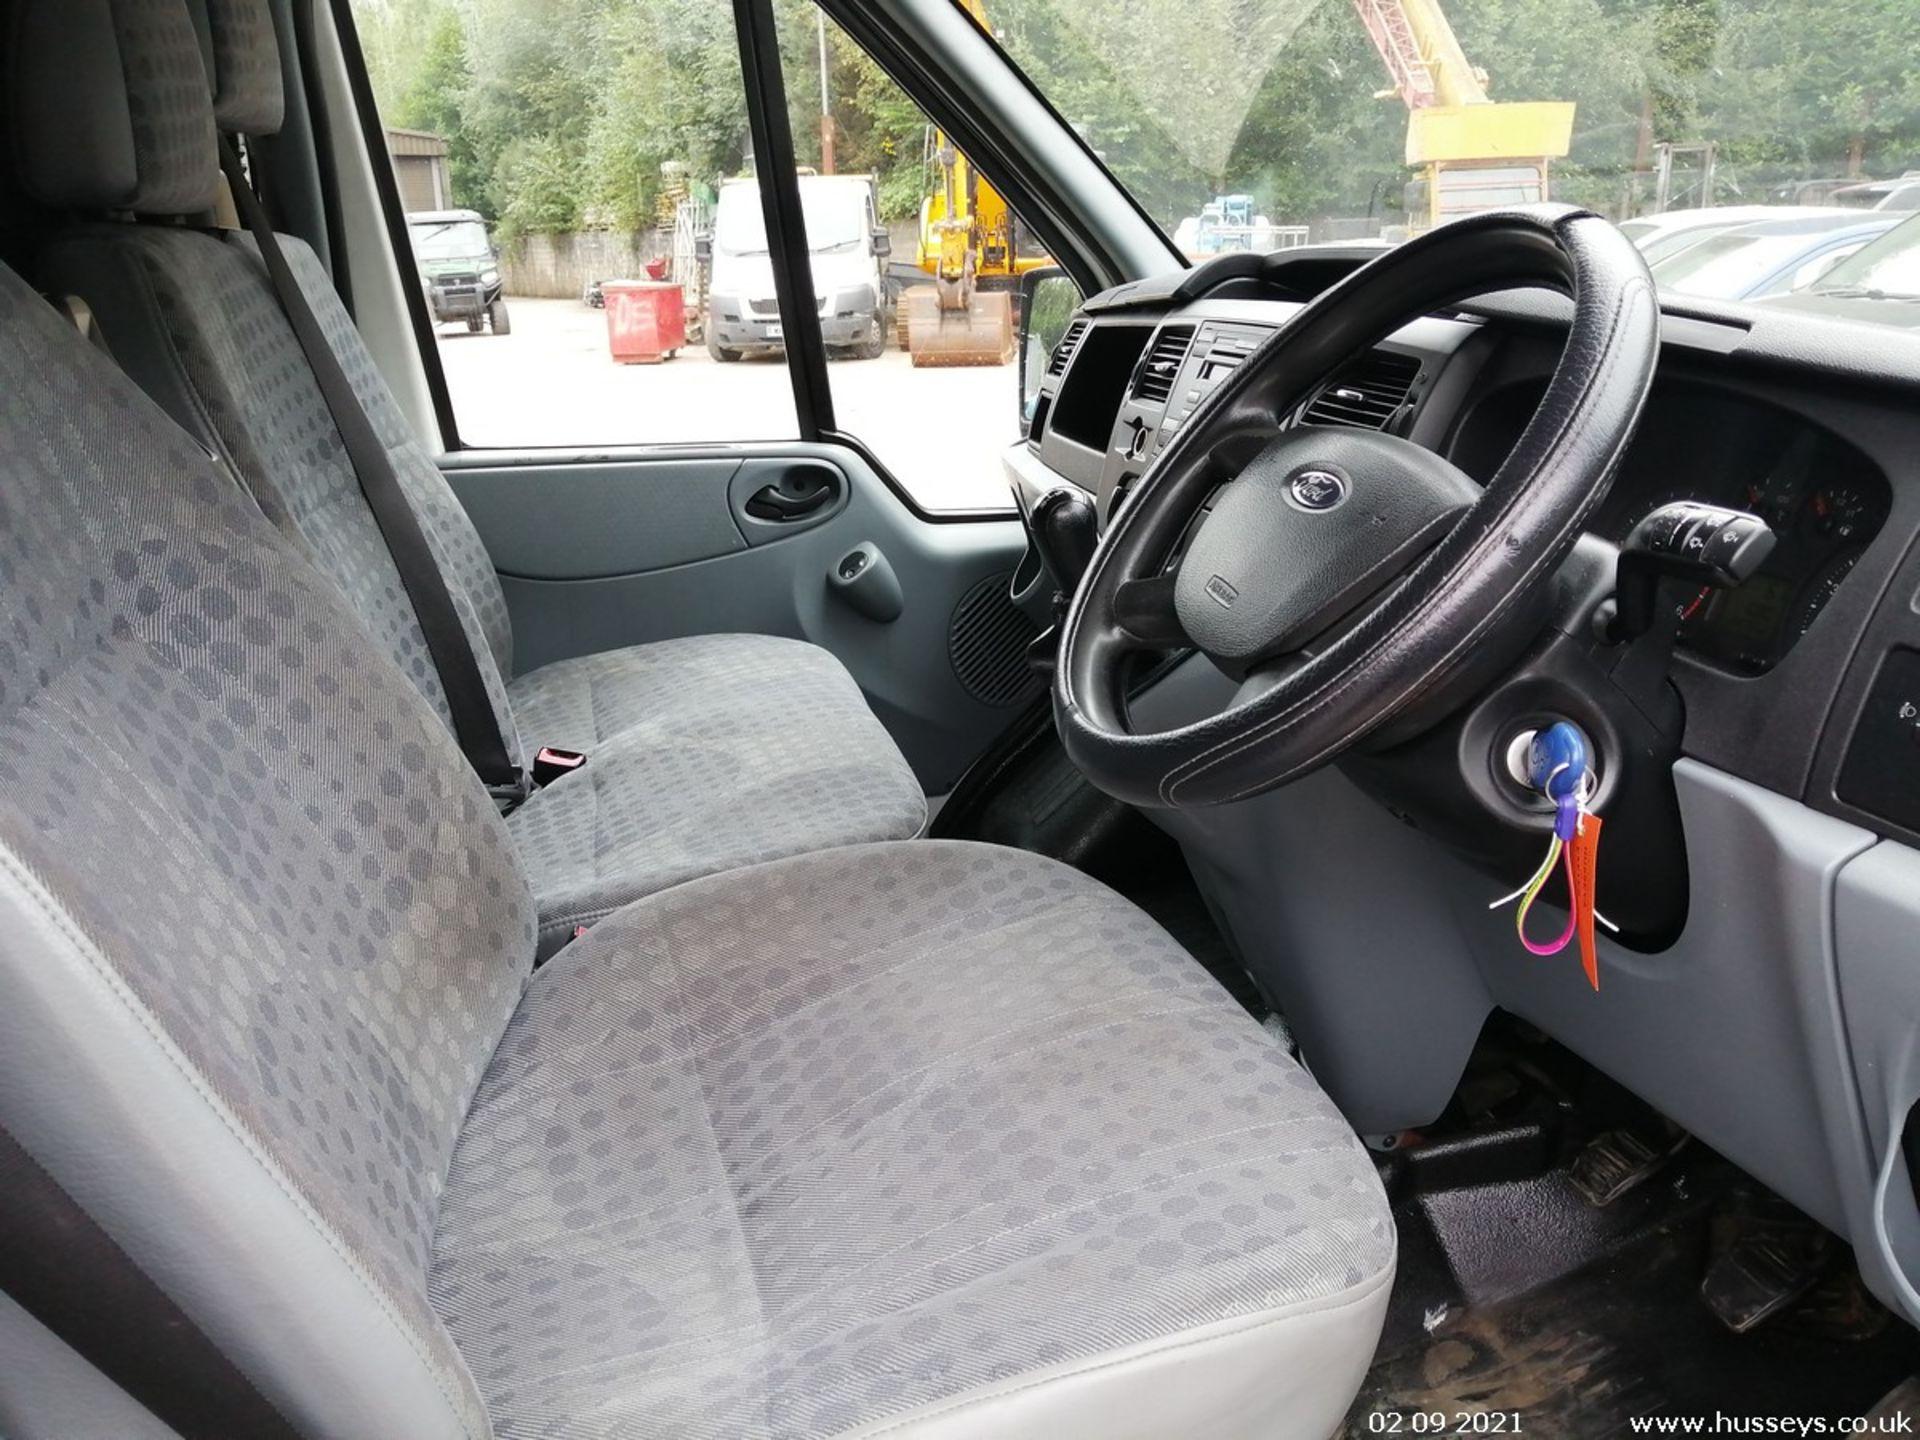 10/60 FORD TRANSIT 85 T260M FWD - 2198cc 5dr Van (White, 237k) - Image 23 of 23